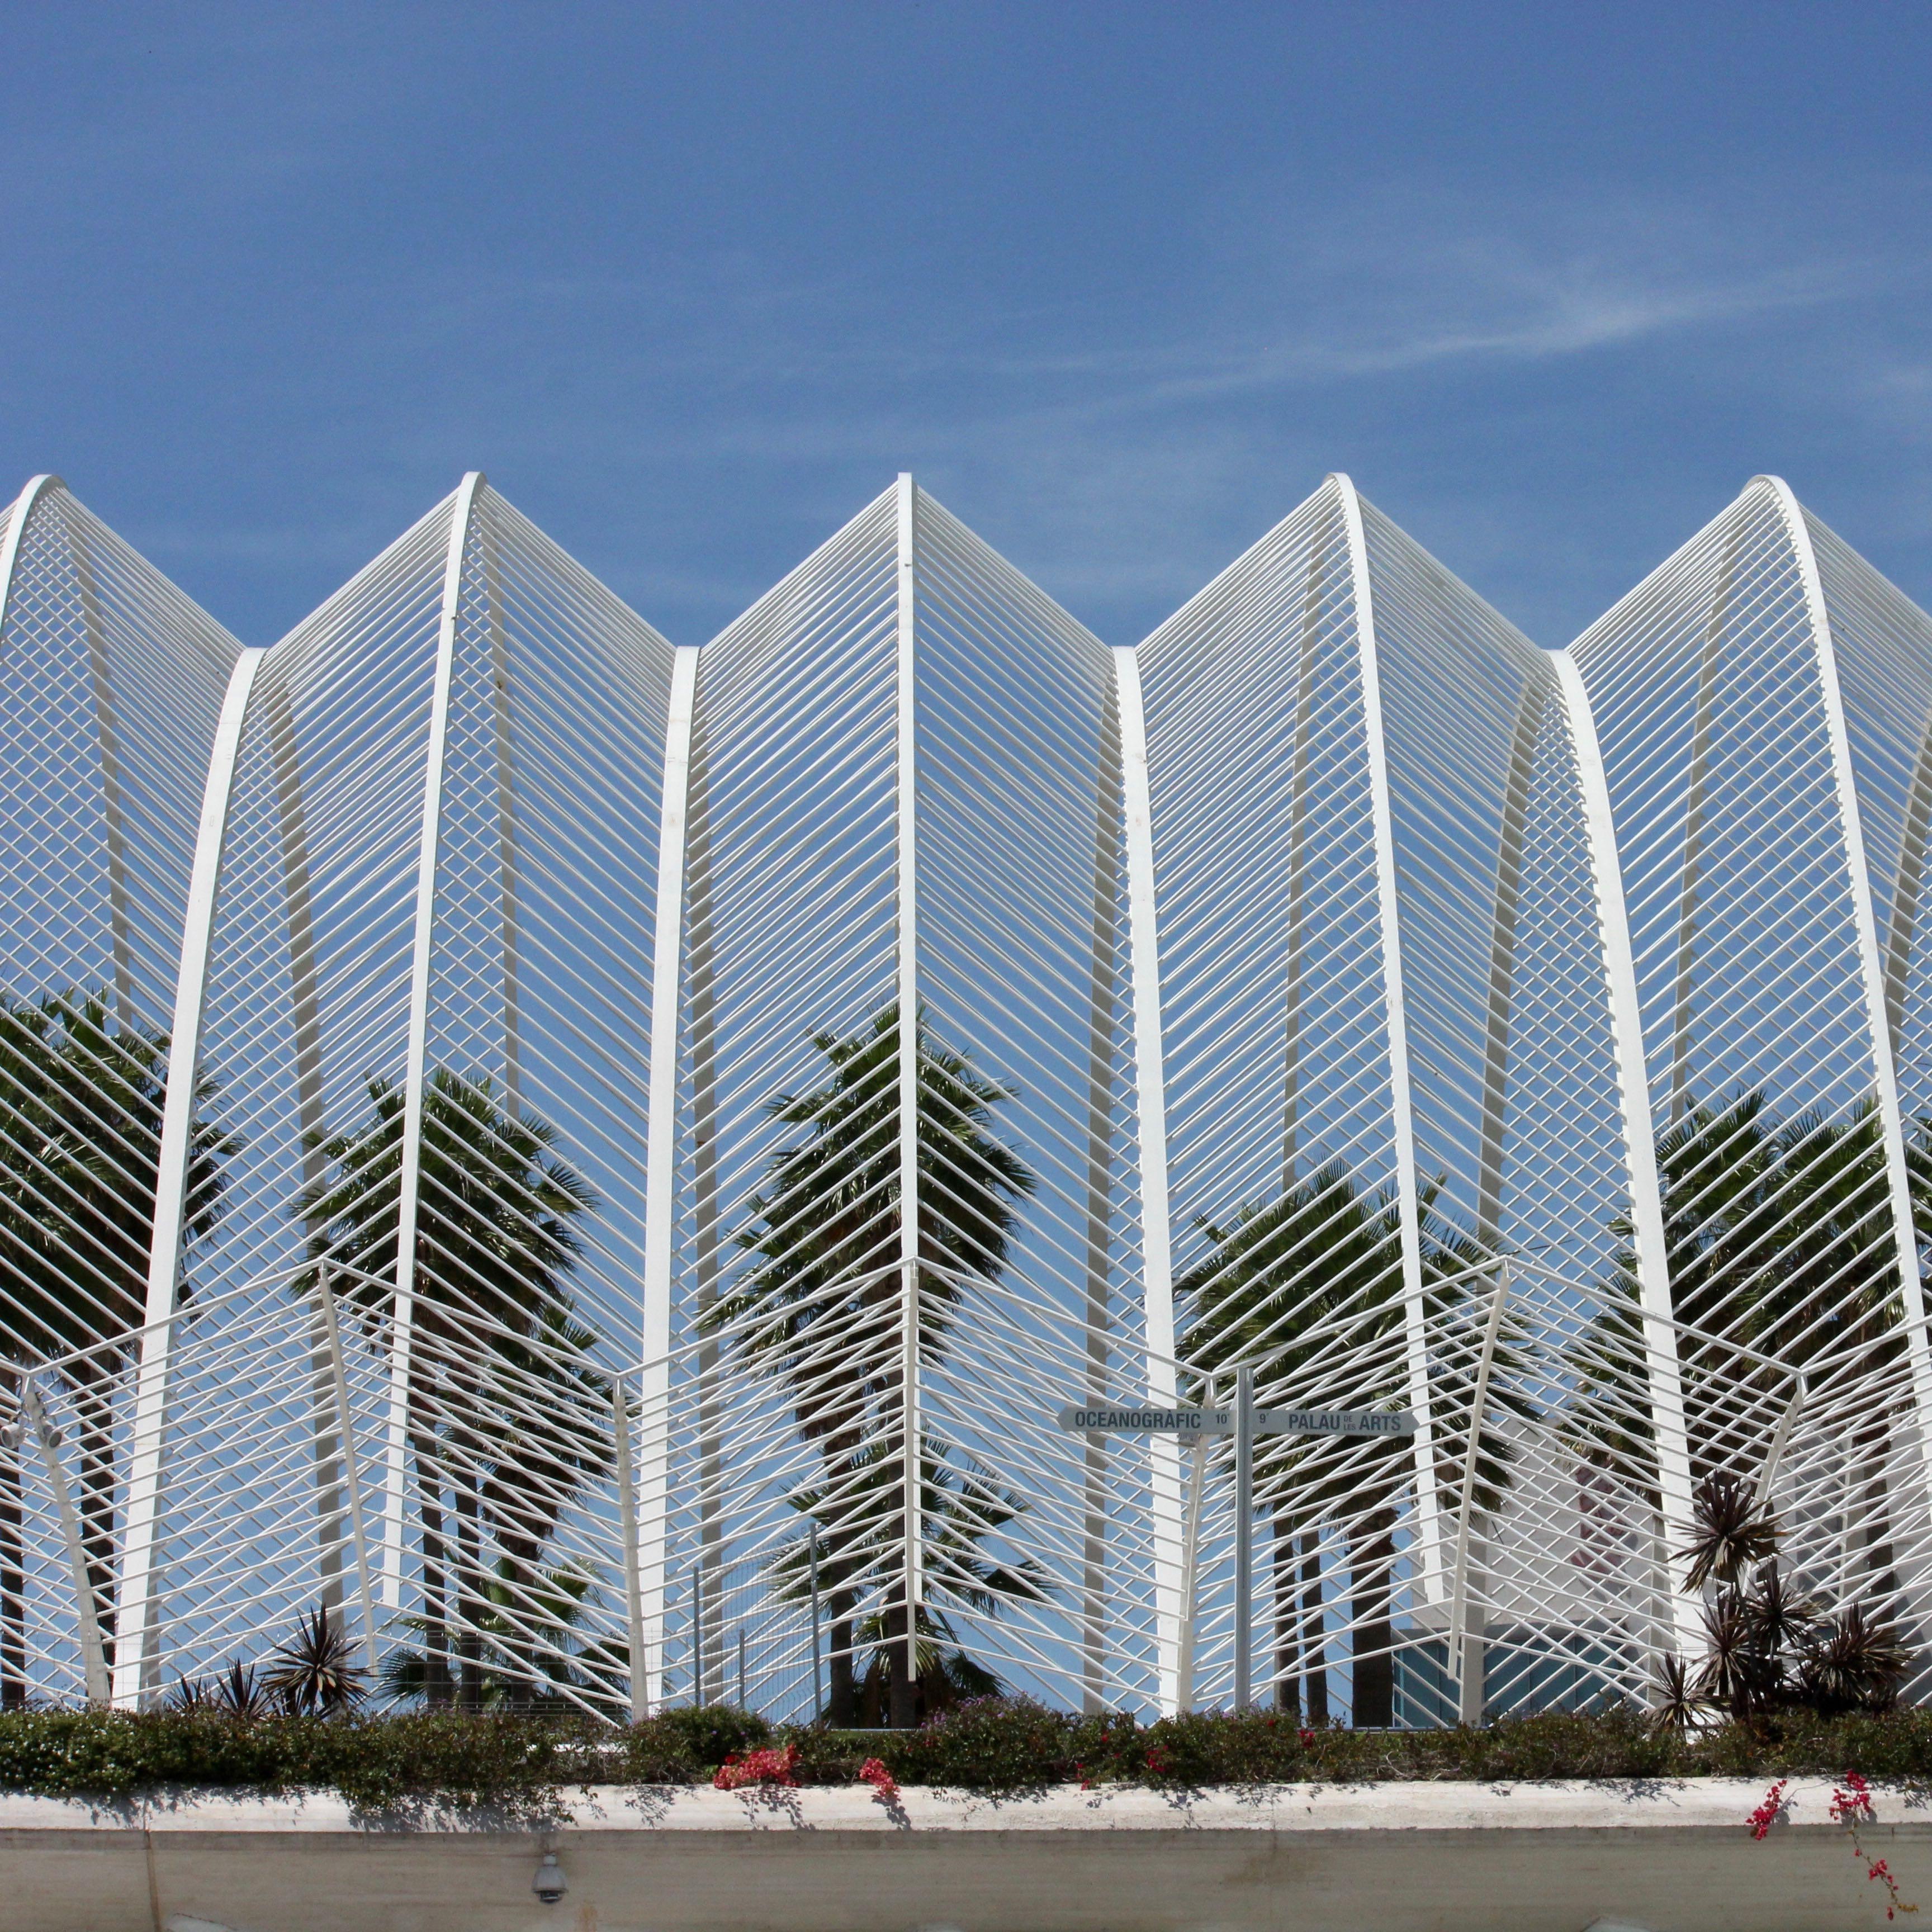 Valencia, Spain Calatrava 3